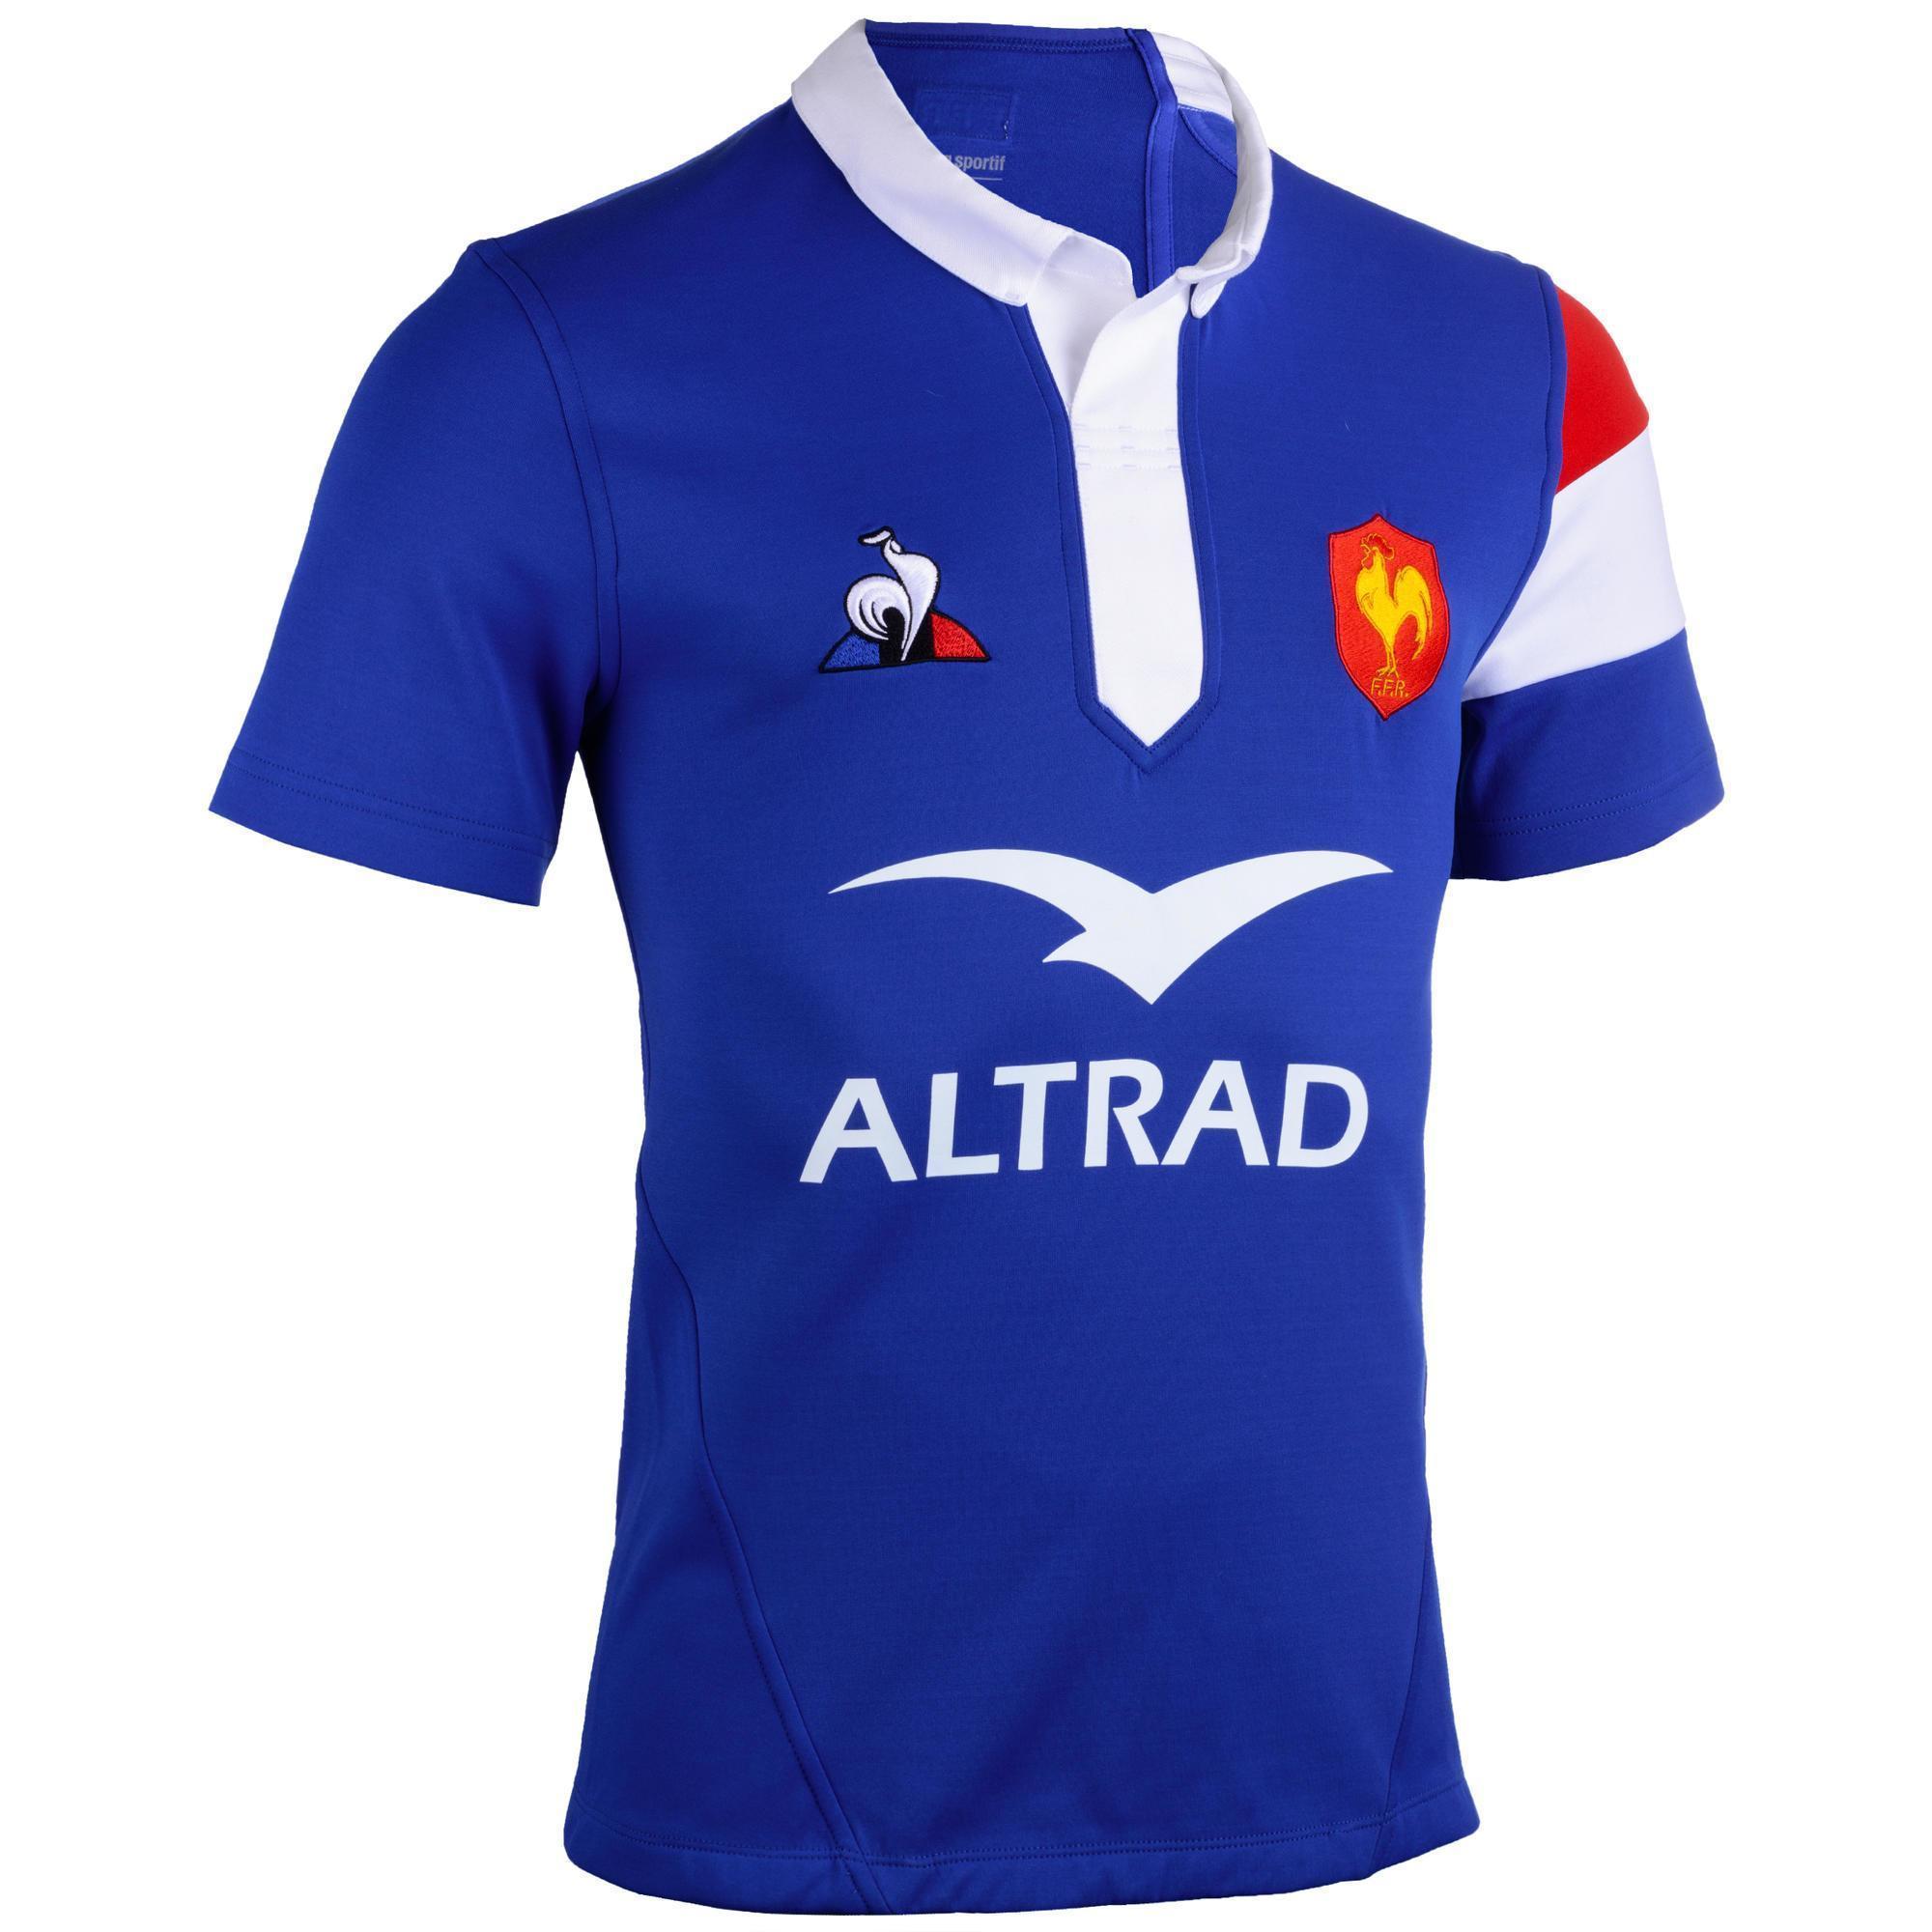 Maillot Equipe de France Rugby Domicile 19